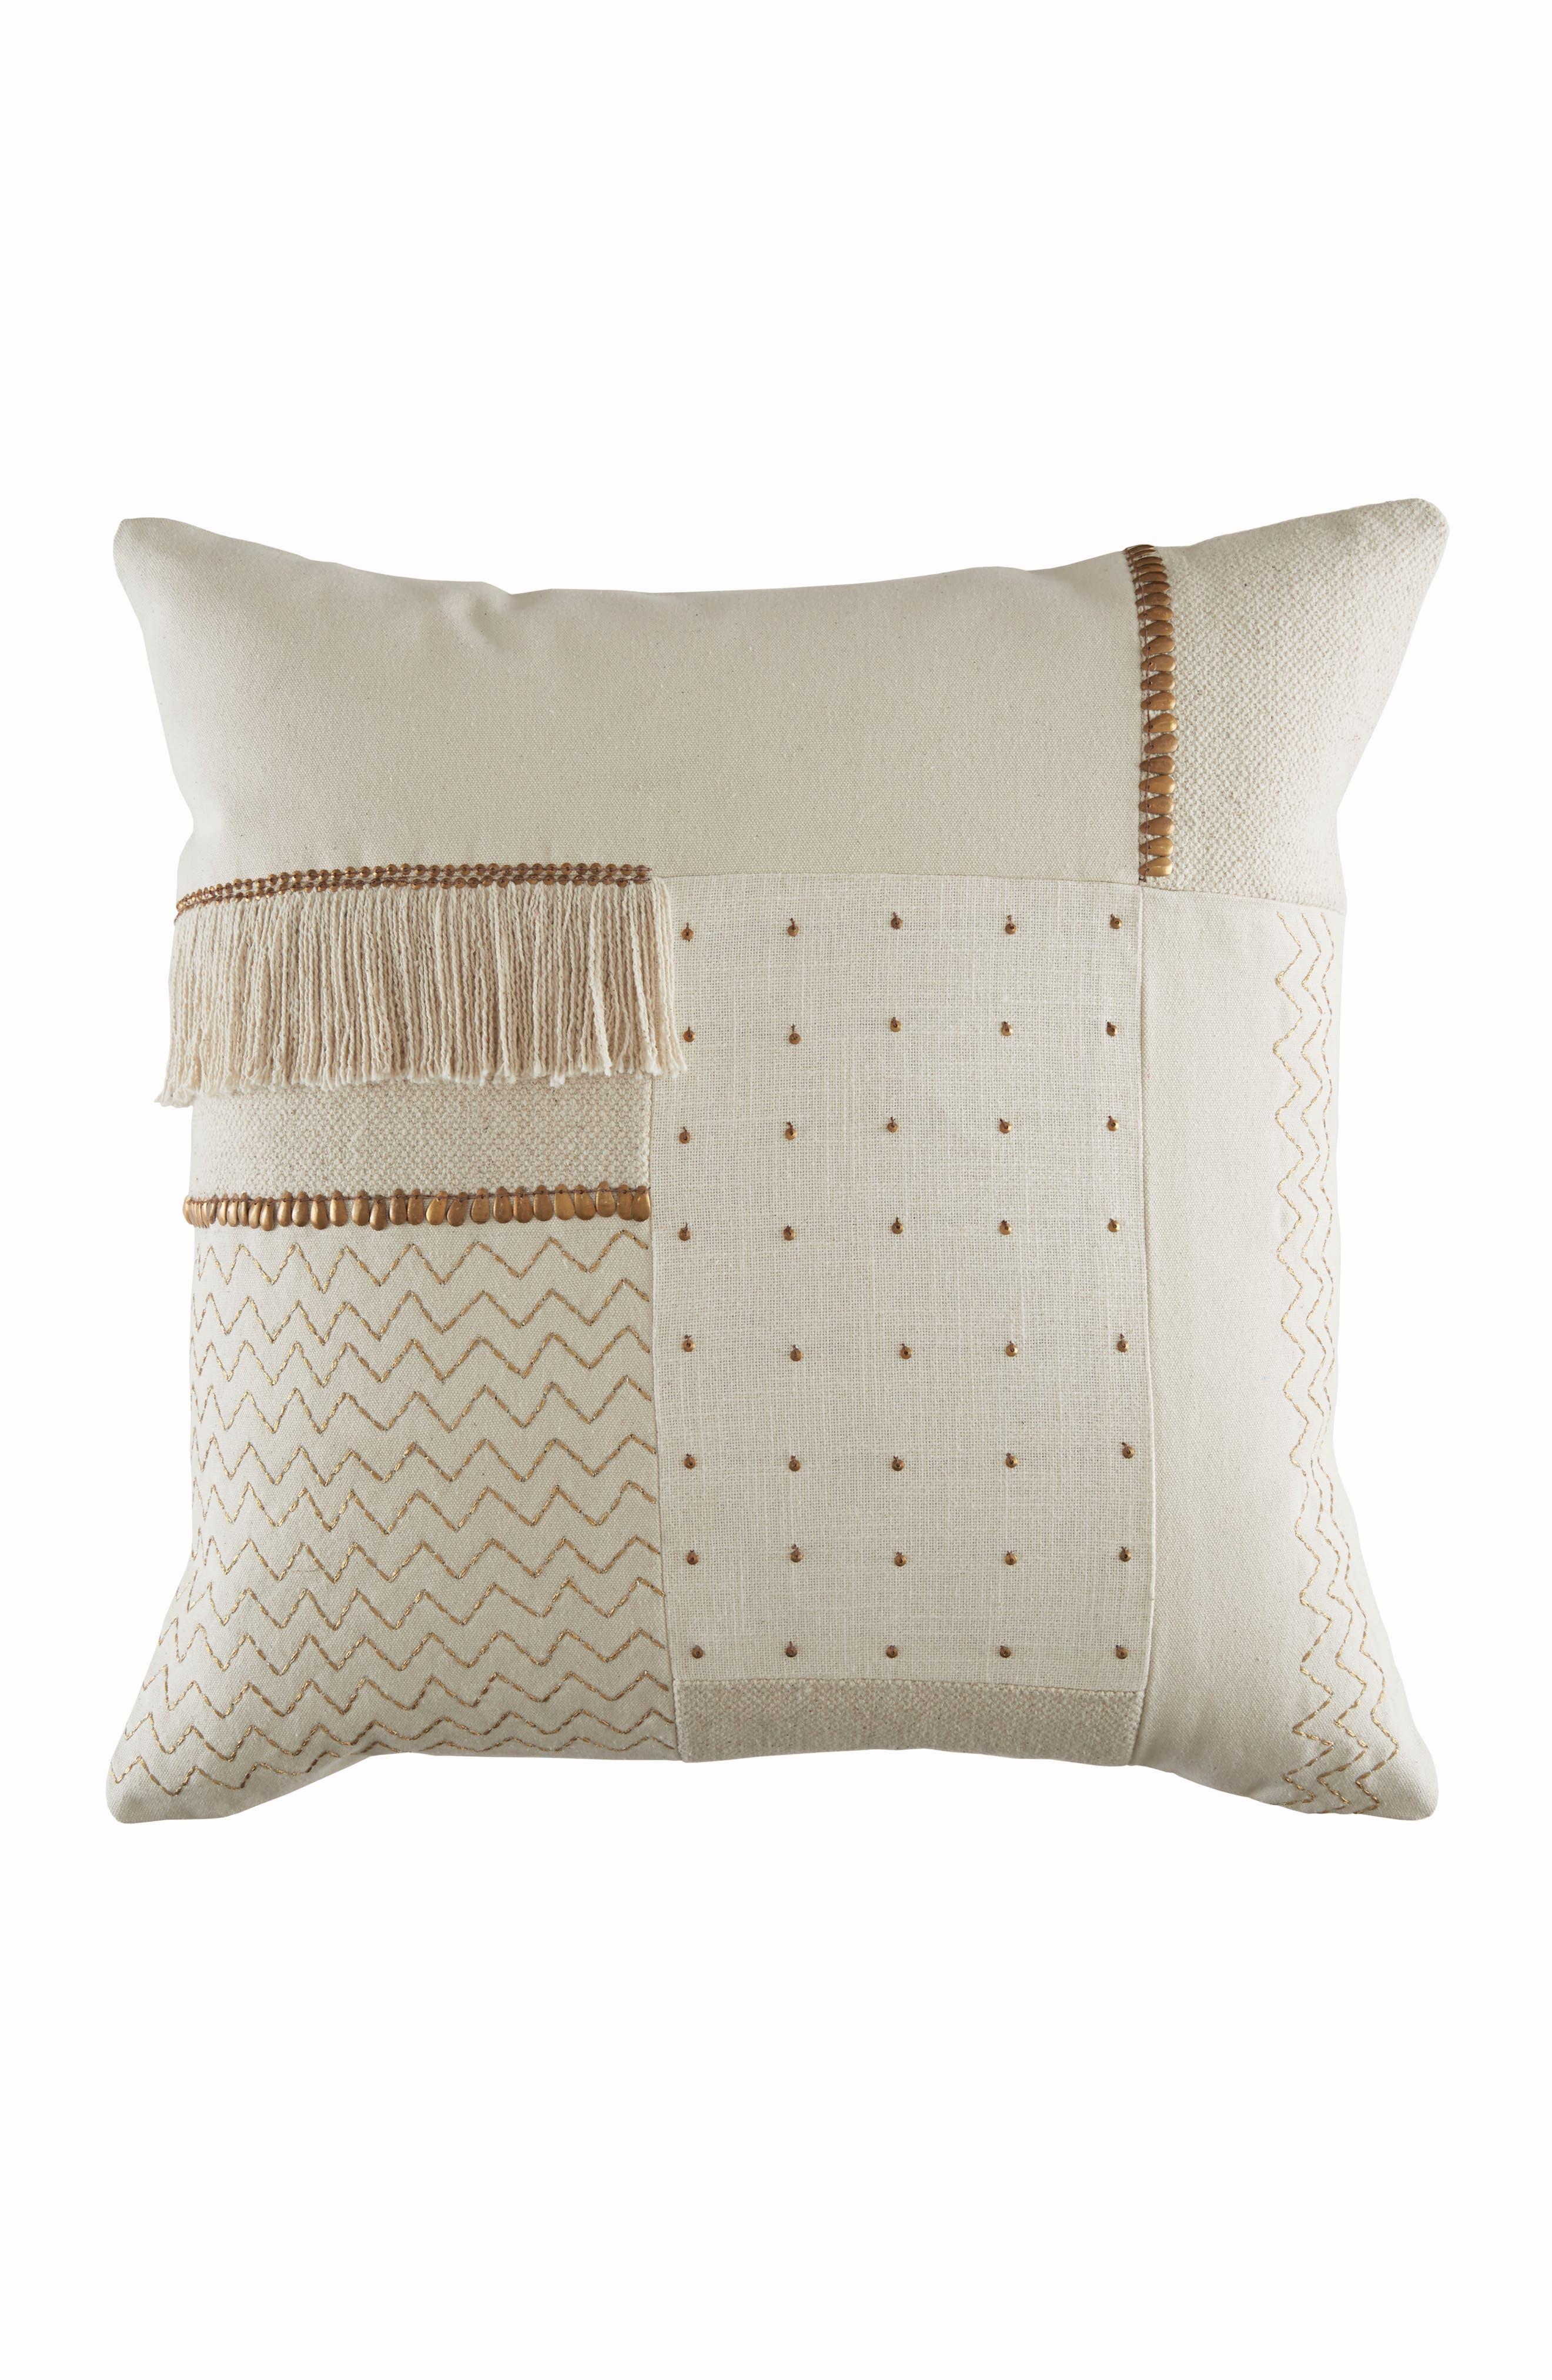 Alternate Image 1 Selected - DwellStudio Zadie Accent Pillow